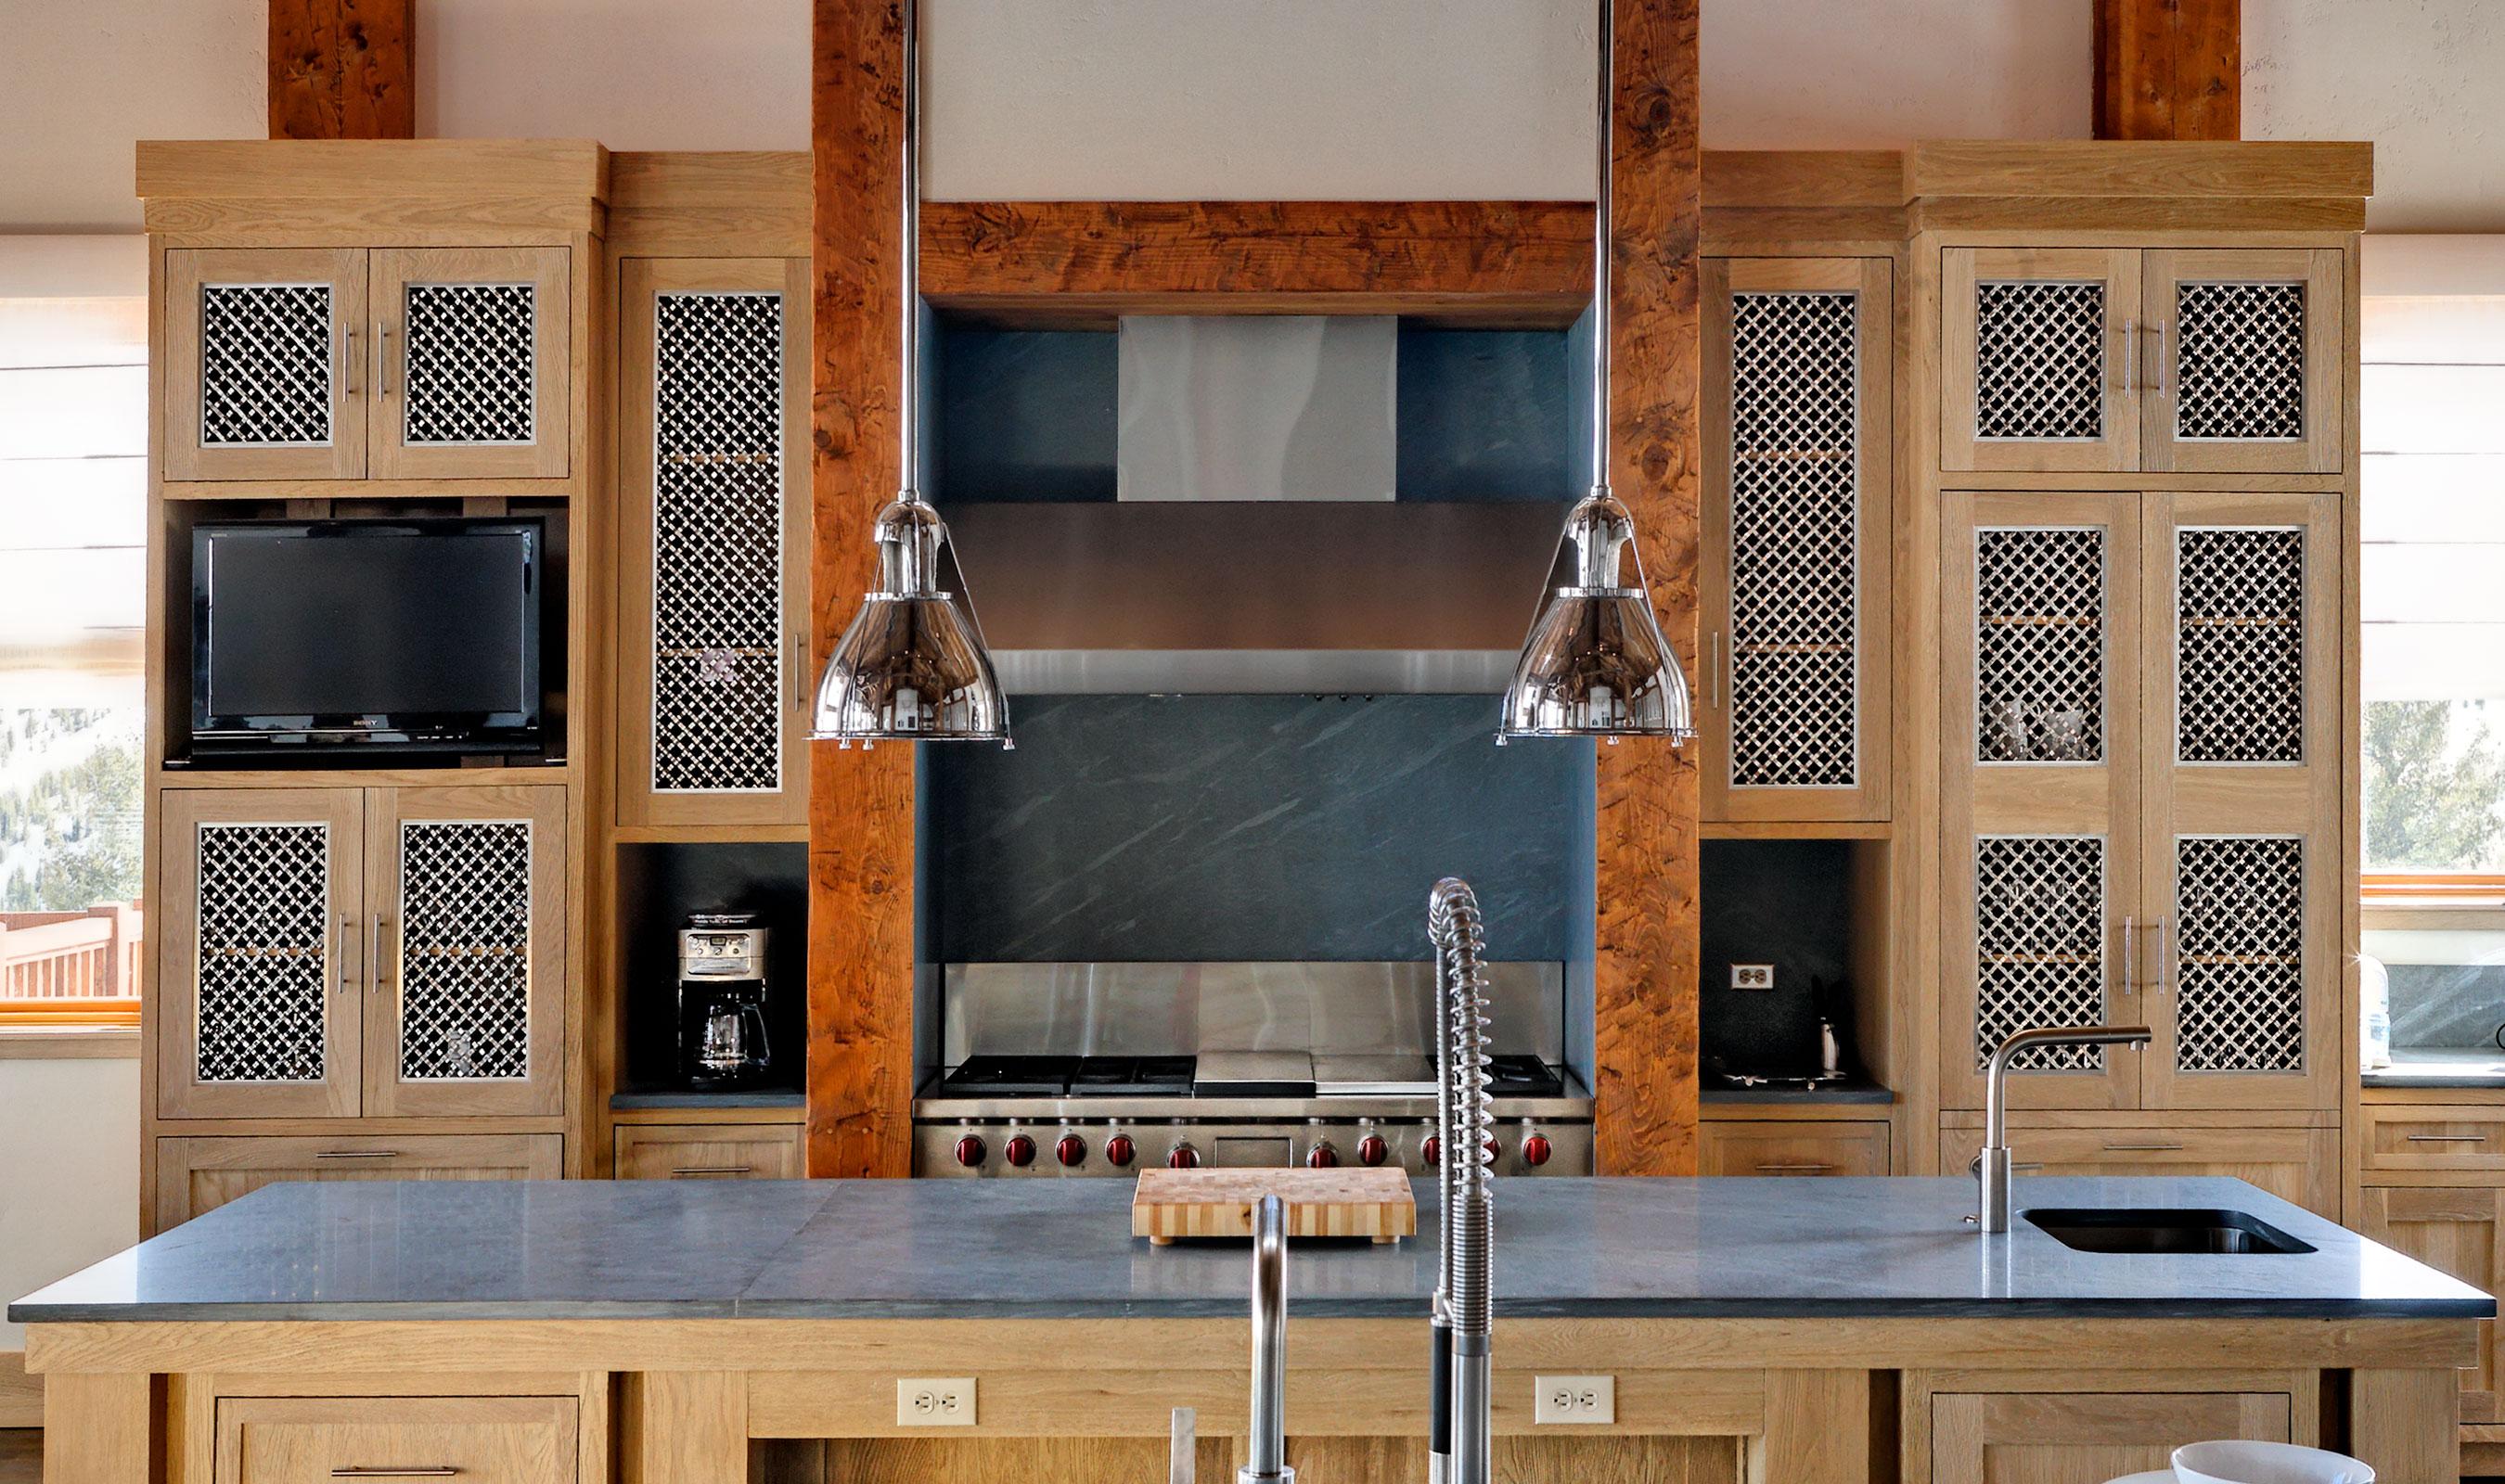 S-15 stainless steel kitchen cabinet mesh